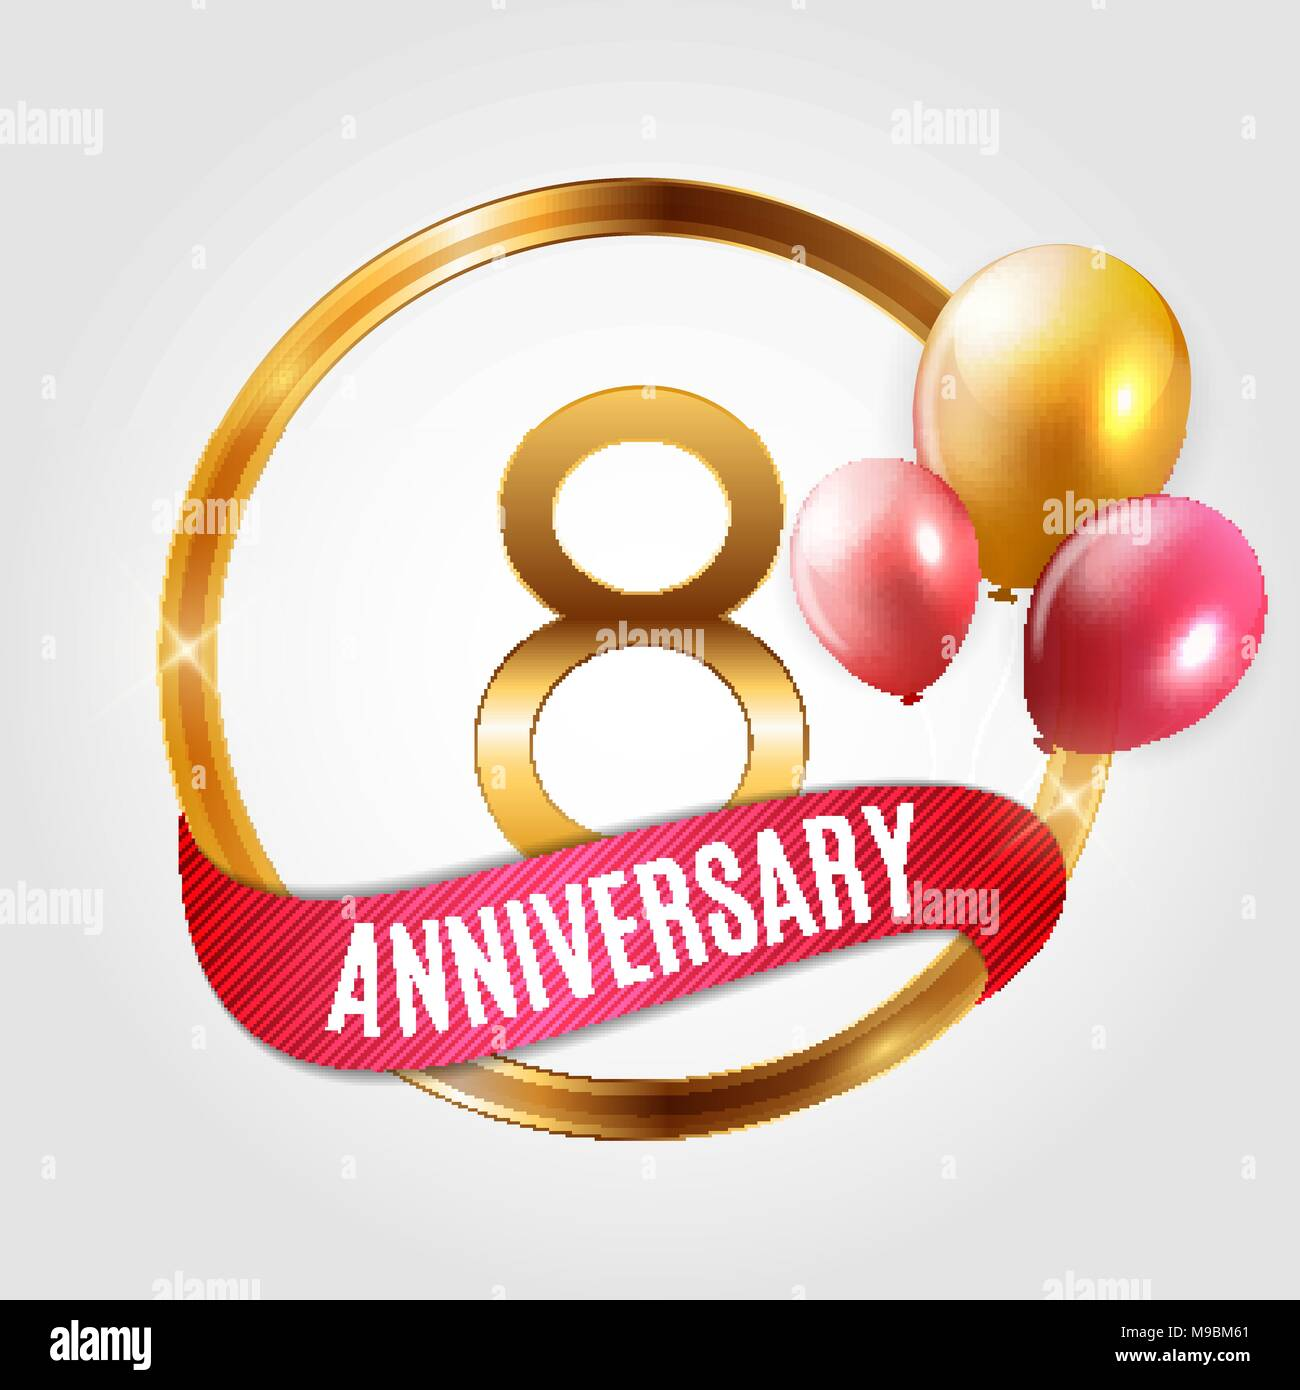 8 Anniversario Di Matrimonio.Template Gold Logo 8 Years Anniversary With Ribbon And Balloons